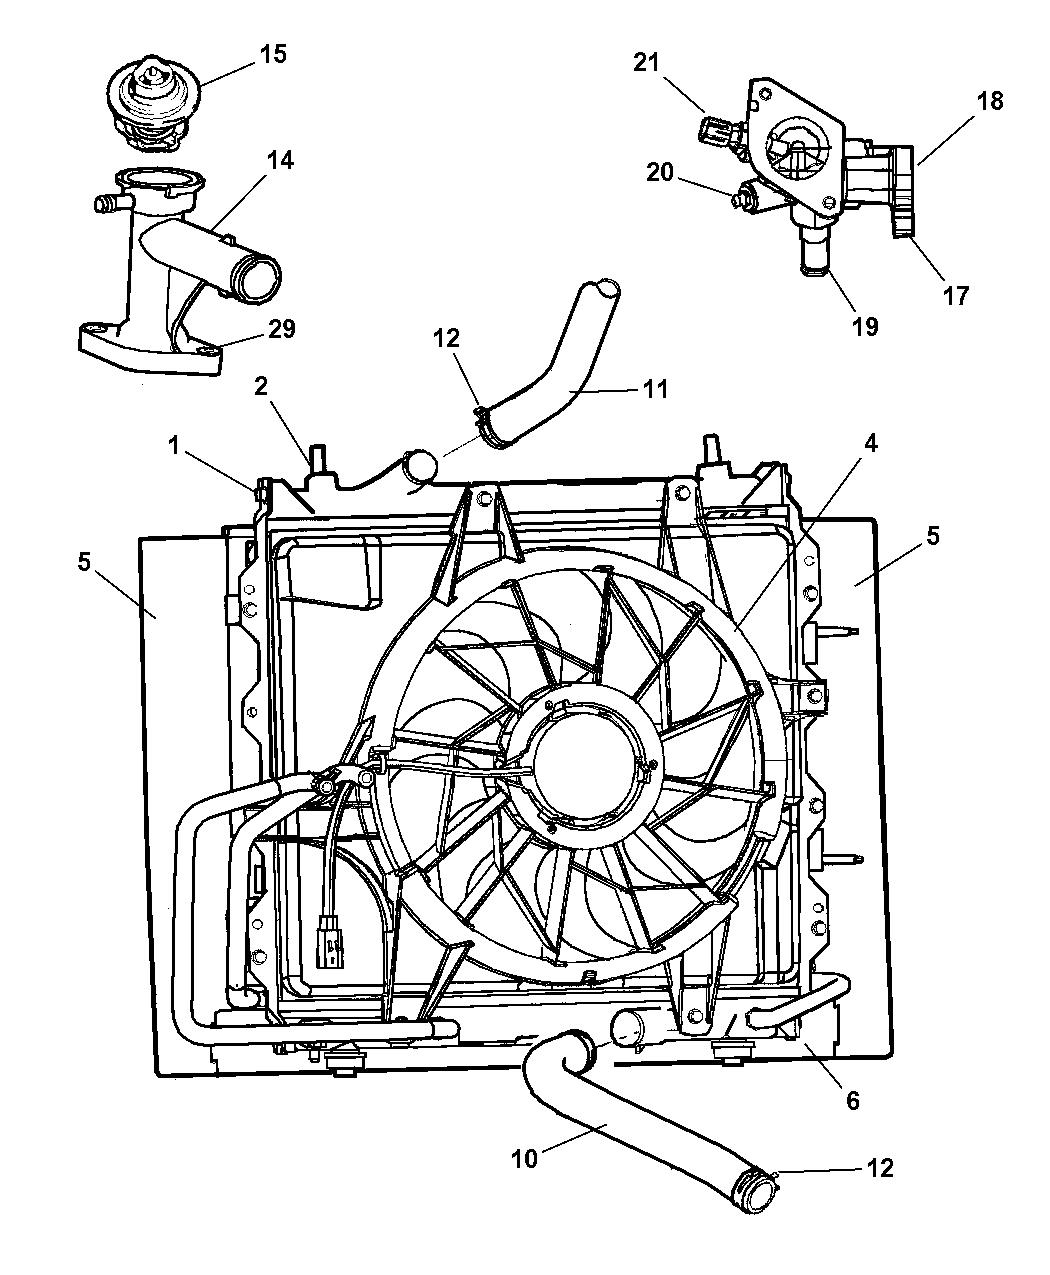 2003 chrysler pt cruiser radiator related parts rh moparpartsgiant com 2004 pt cruiser cooling system diagram 2002 pt cruiser cooling system diagram